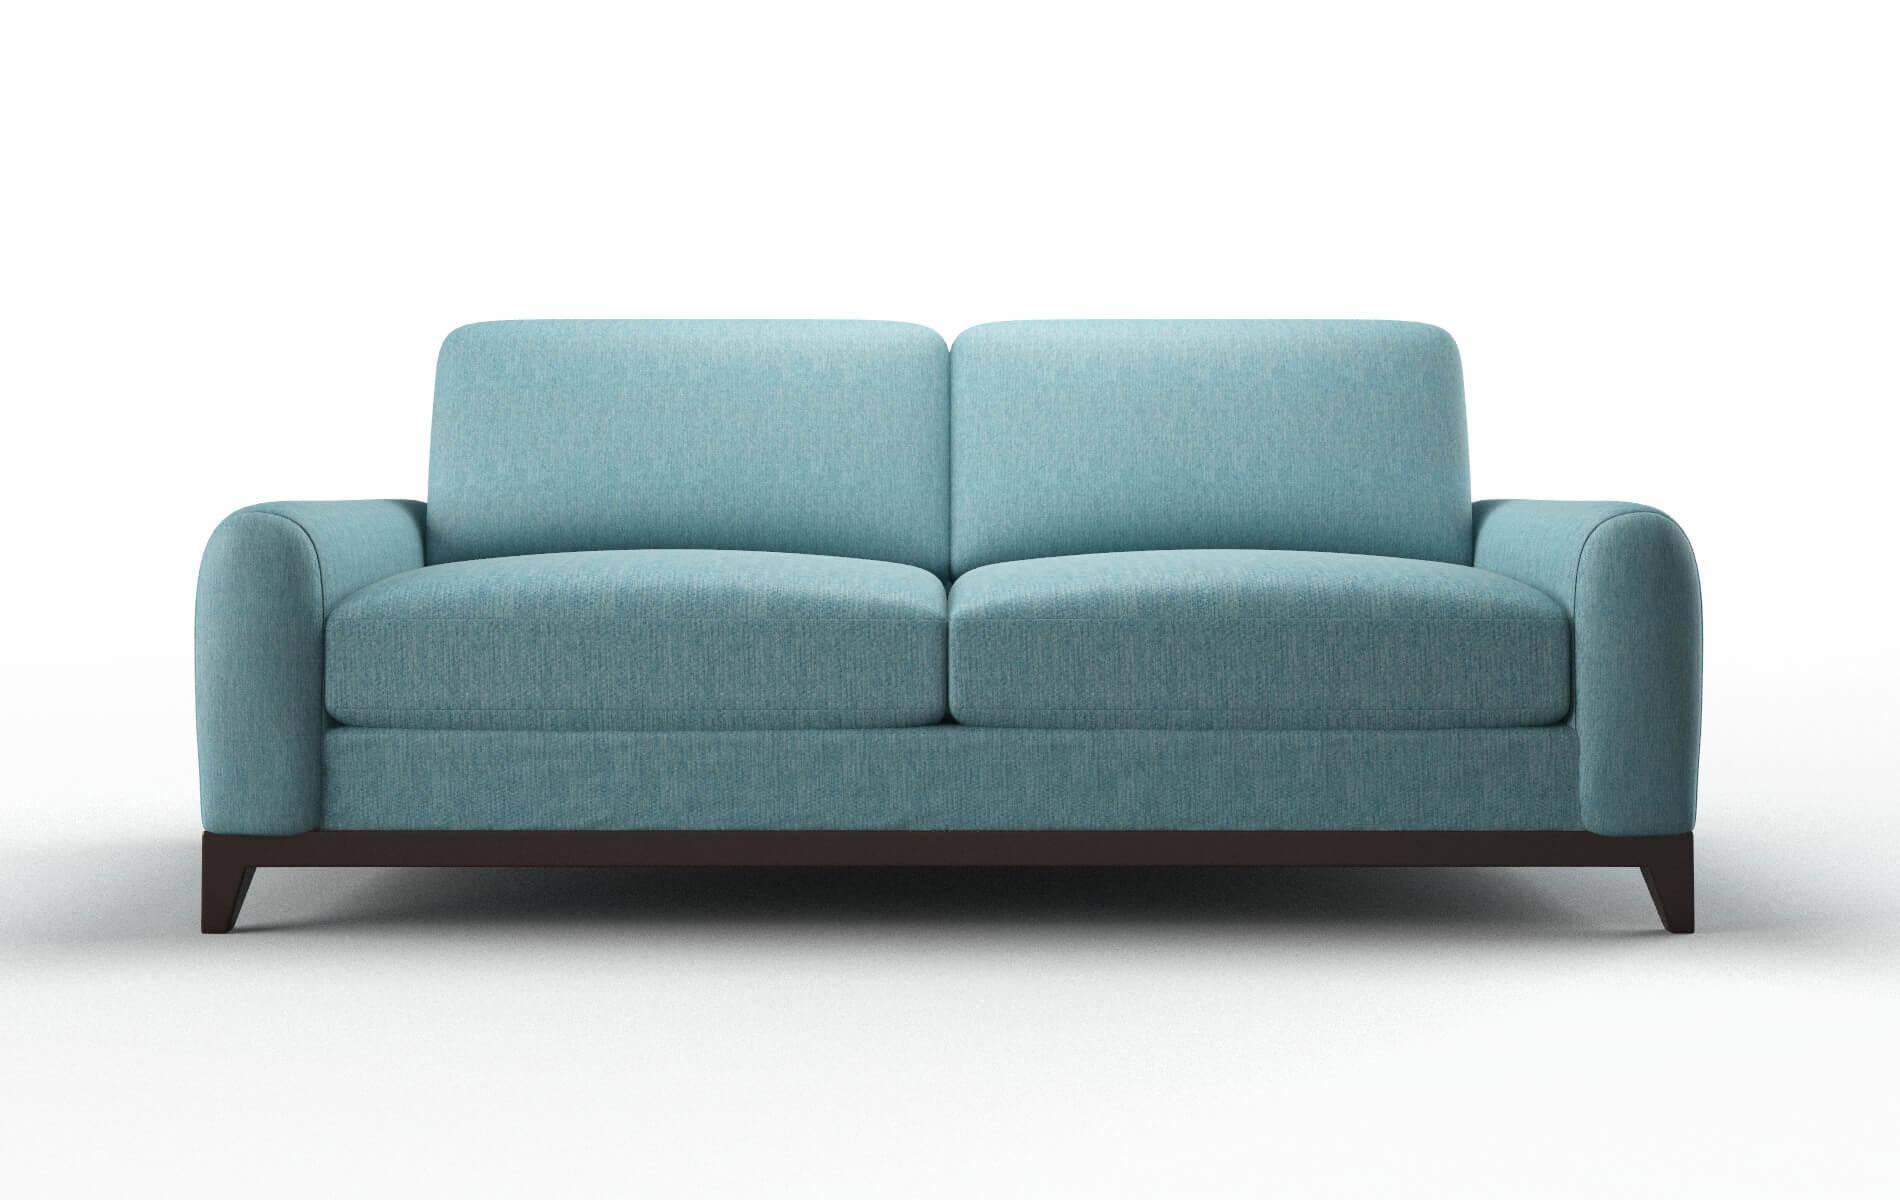 Mykonos Cosmo Turquoise Sofa espresso legs 1